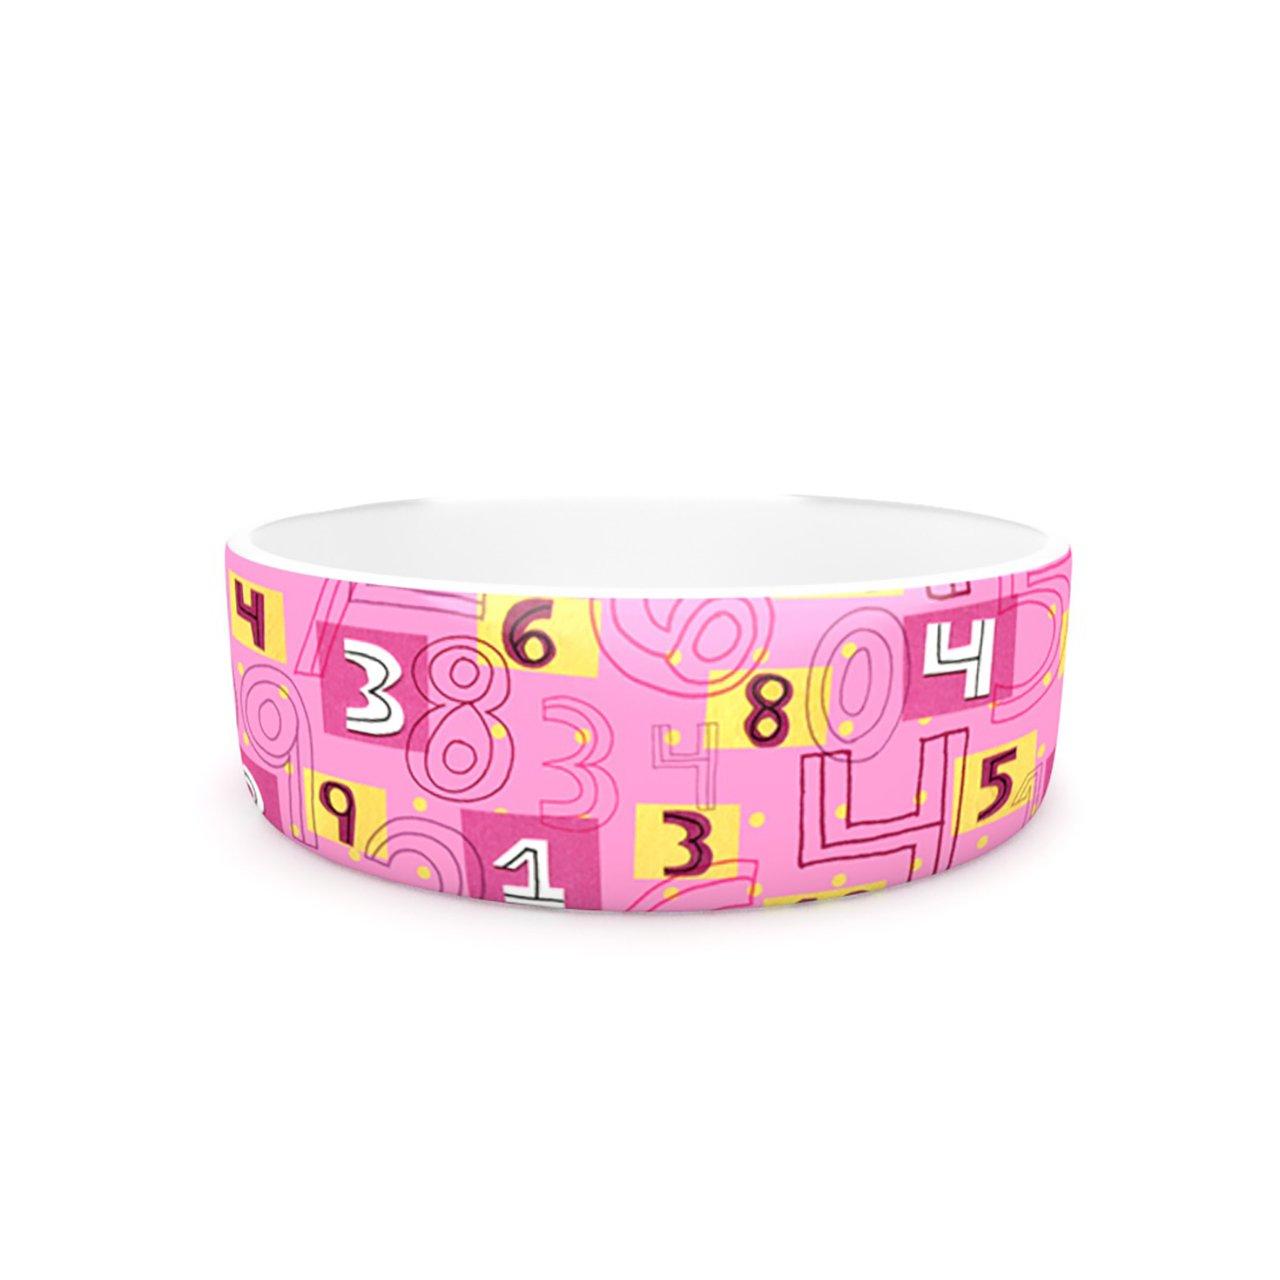 Kess InHouse Jane Smith Vintage Playground II  Pet Bowl, 7-Inch, Pink Yellow